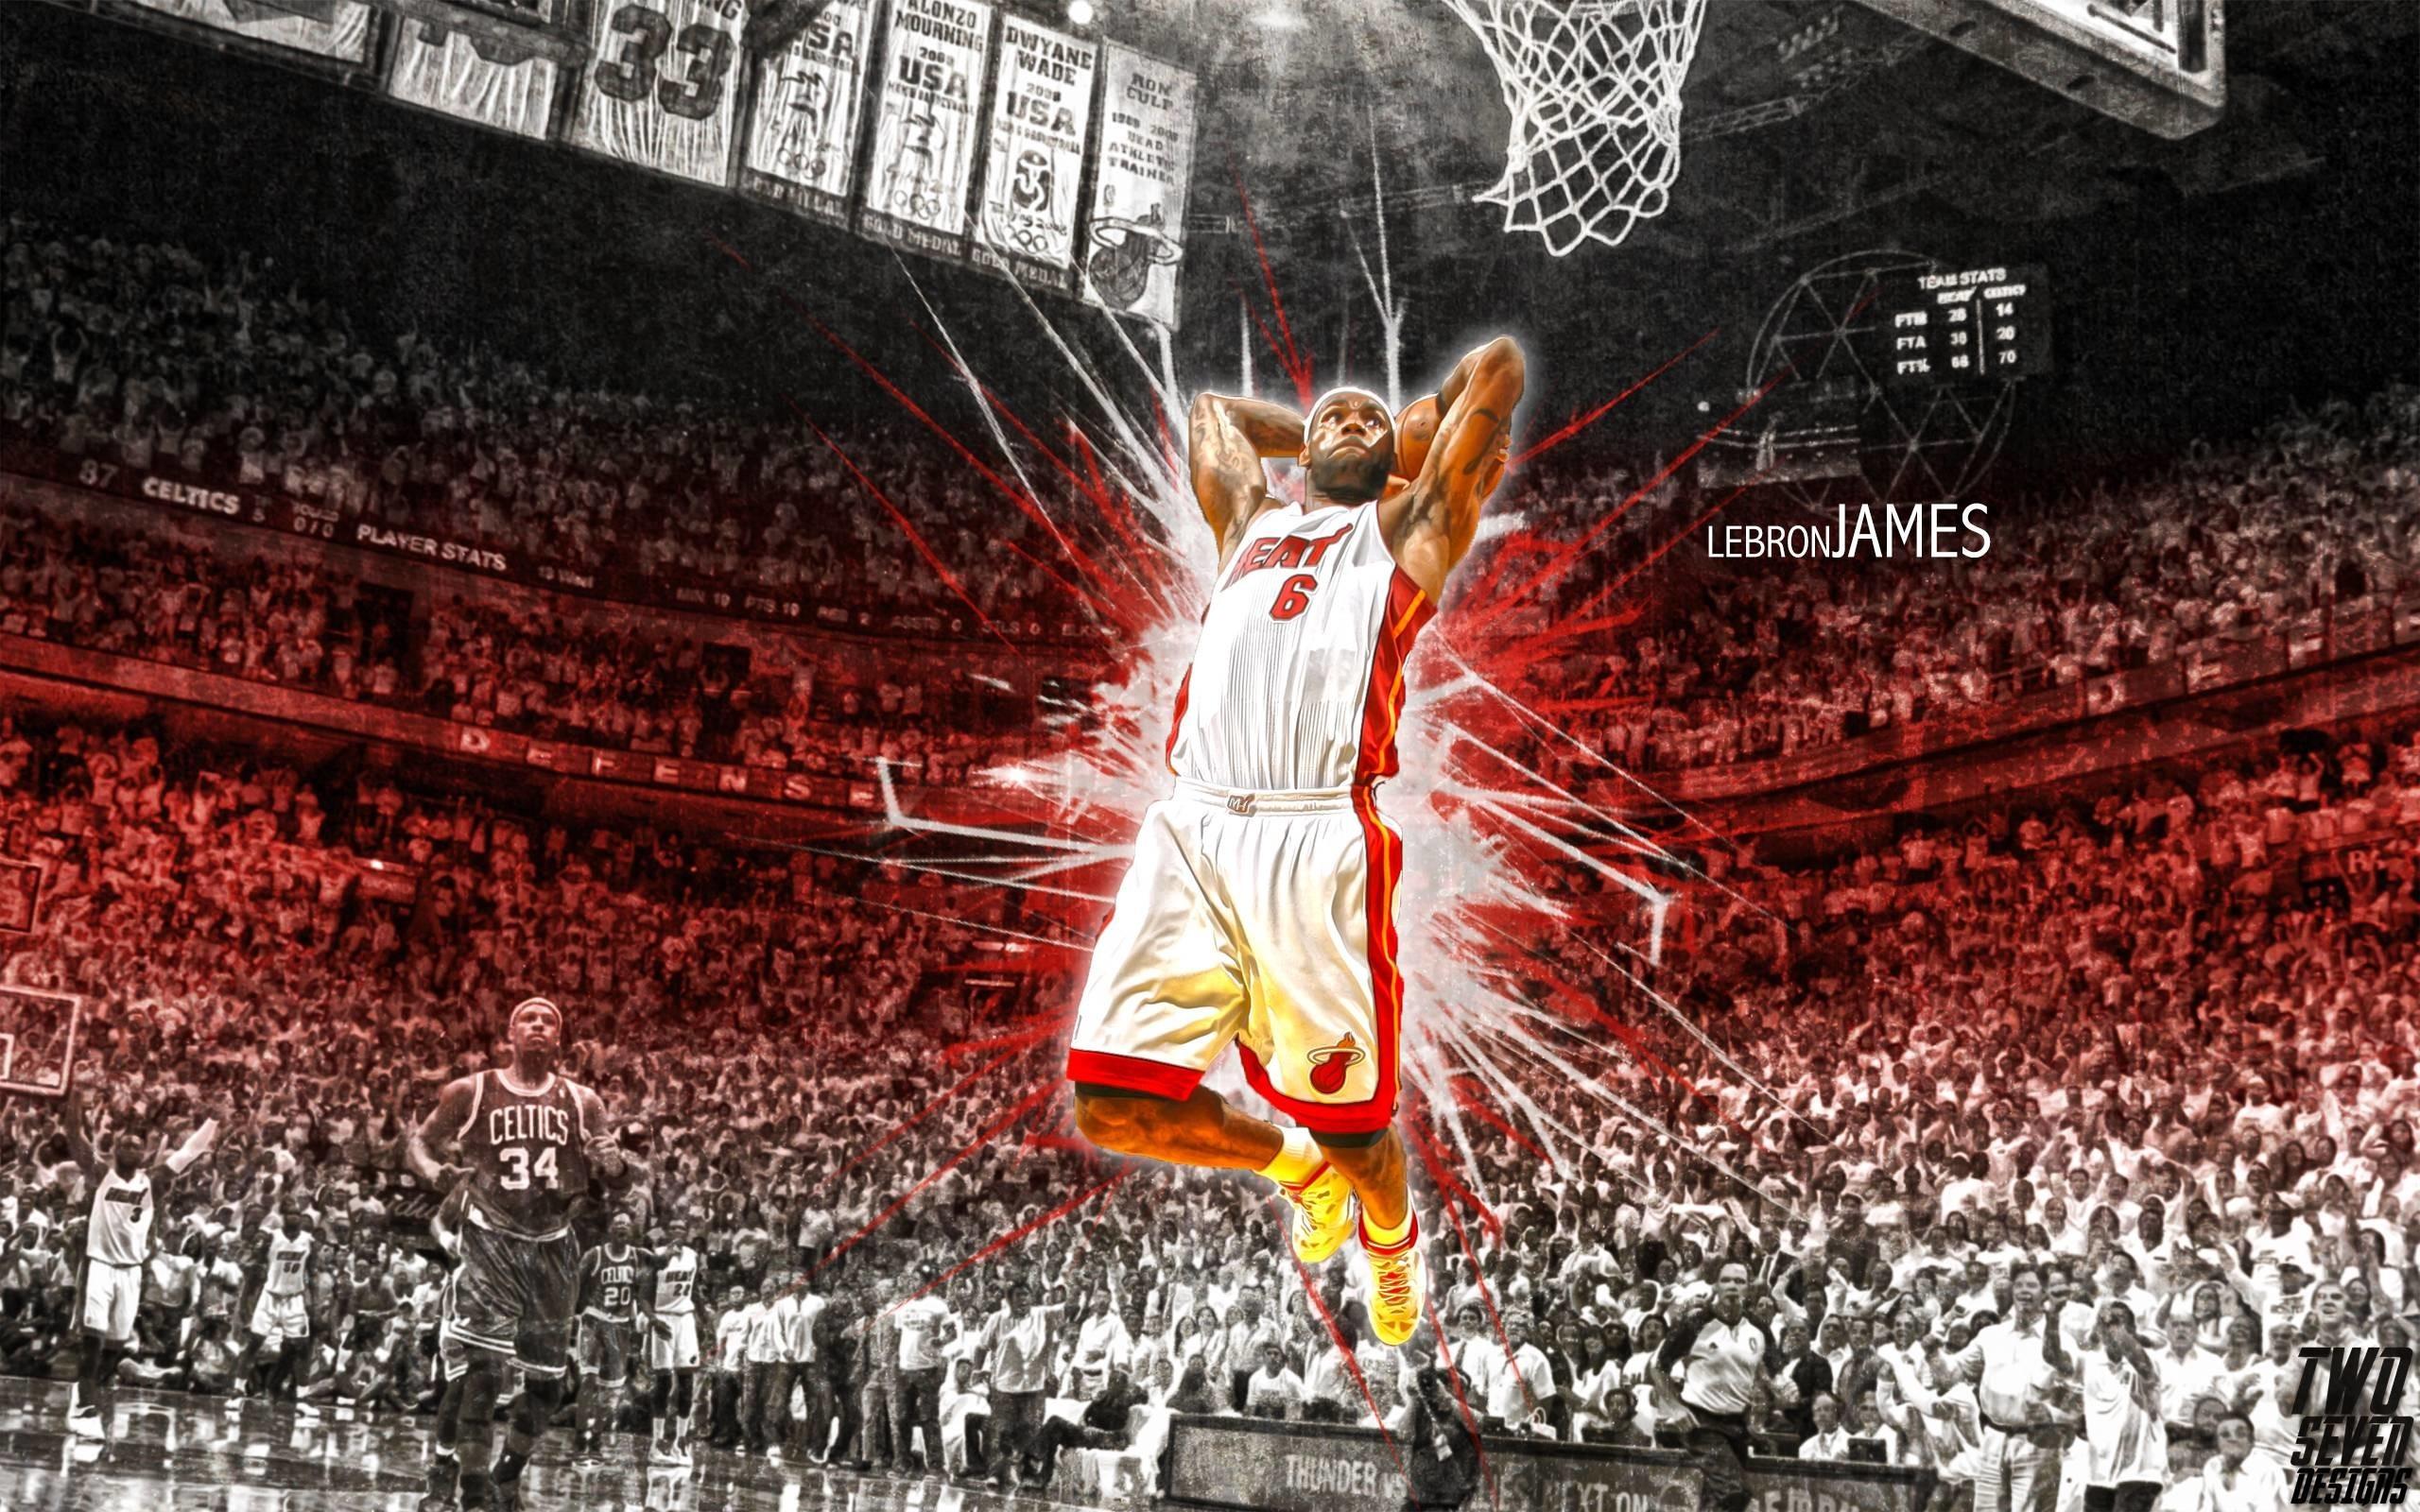 2560x1440 Lebron James Cleveland Cavaliers Wallpaper Hd Resolution